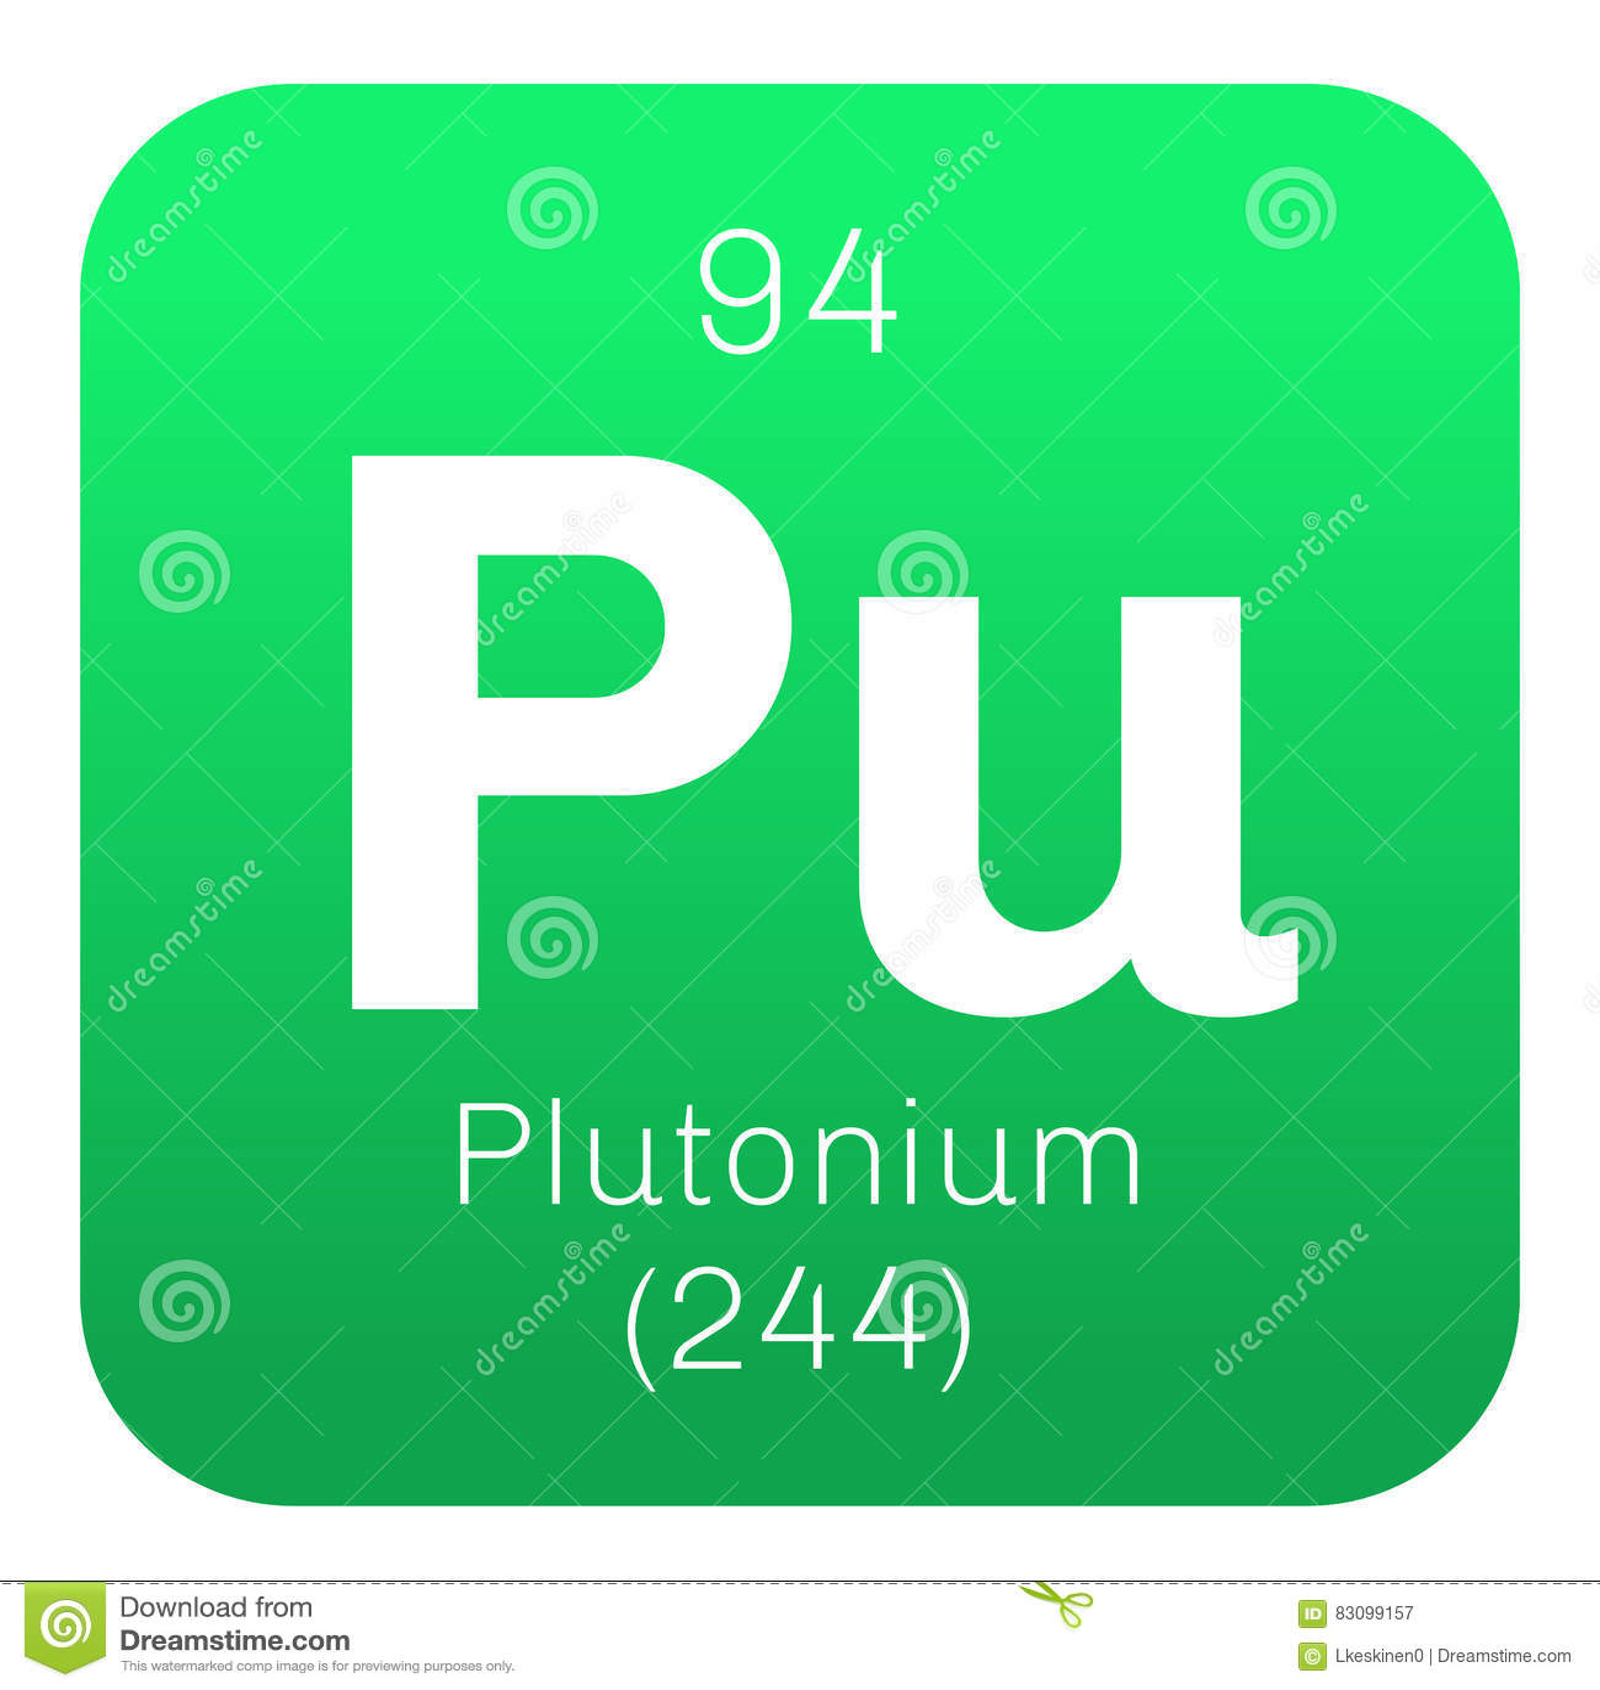 Plutonium chemical element stock vector. Image of element ...